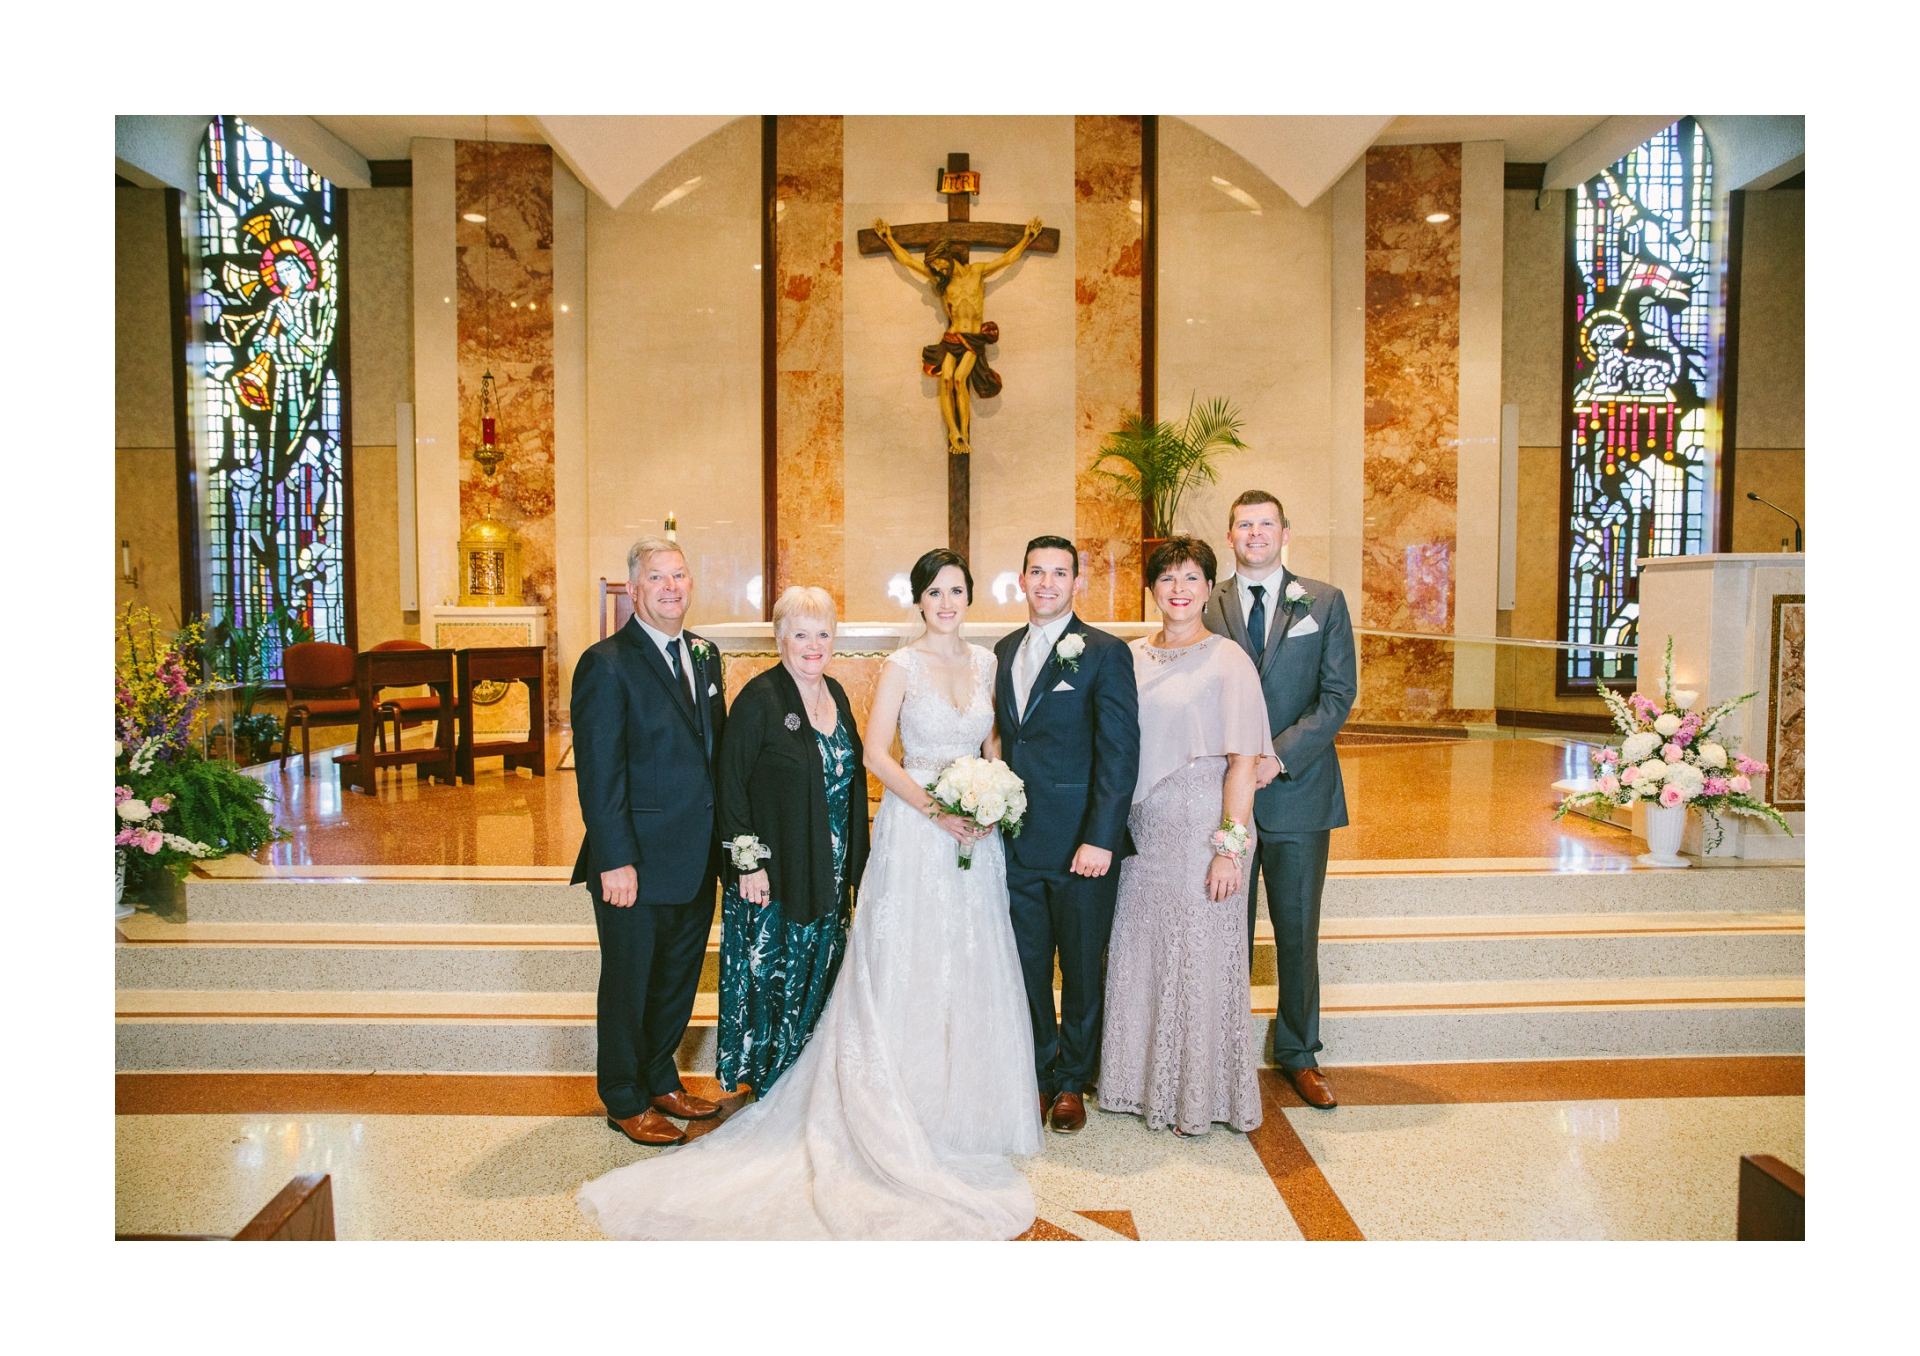 Intercontinental Hotel Wedding in Cleveland 1 42.jpg